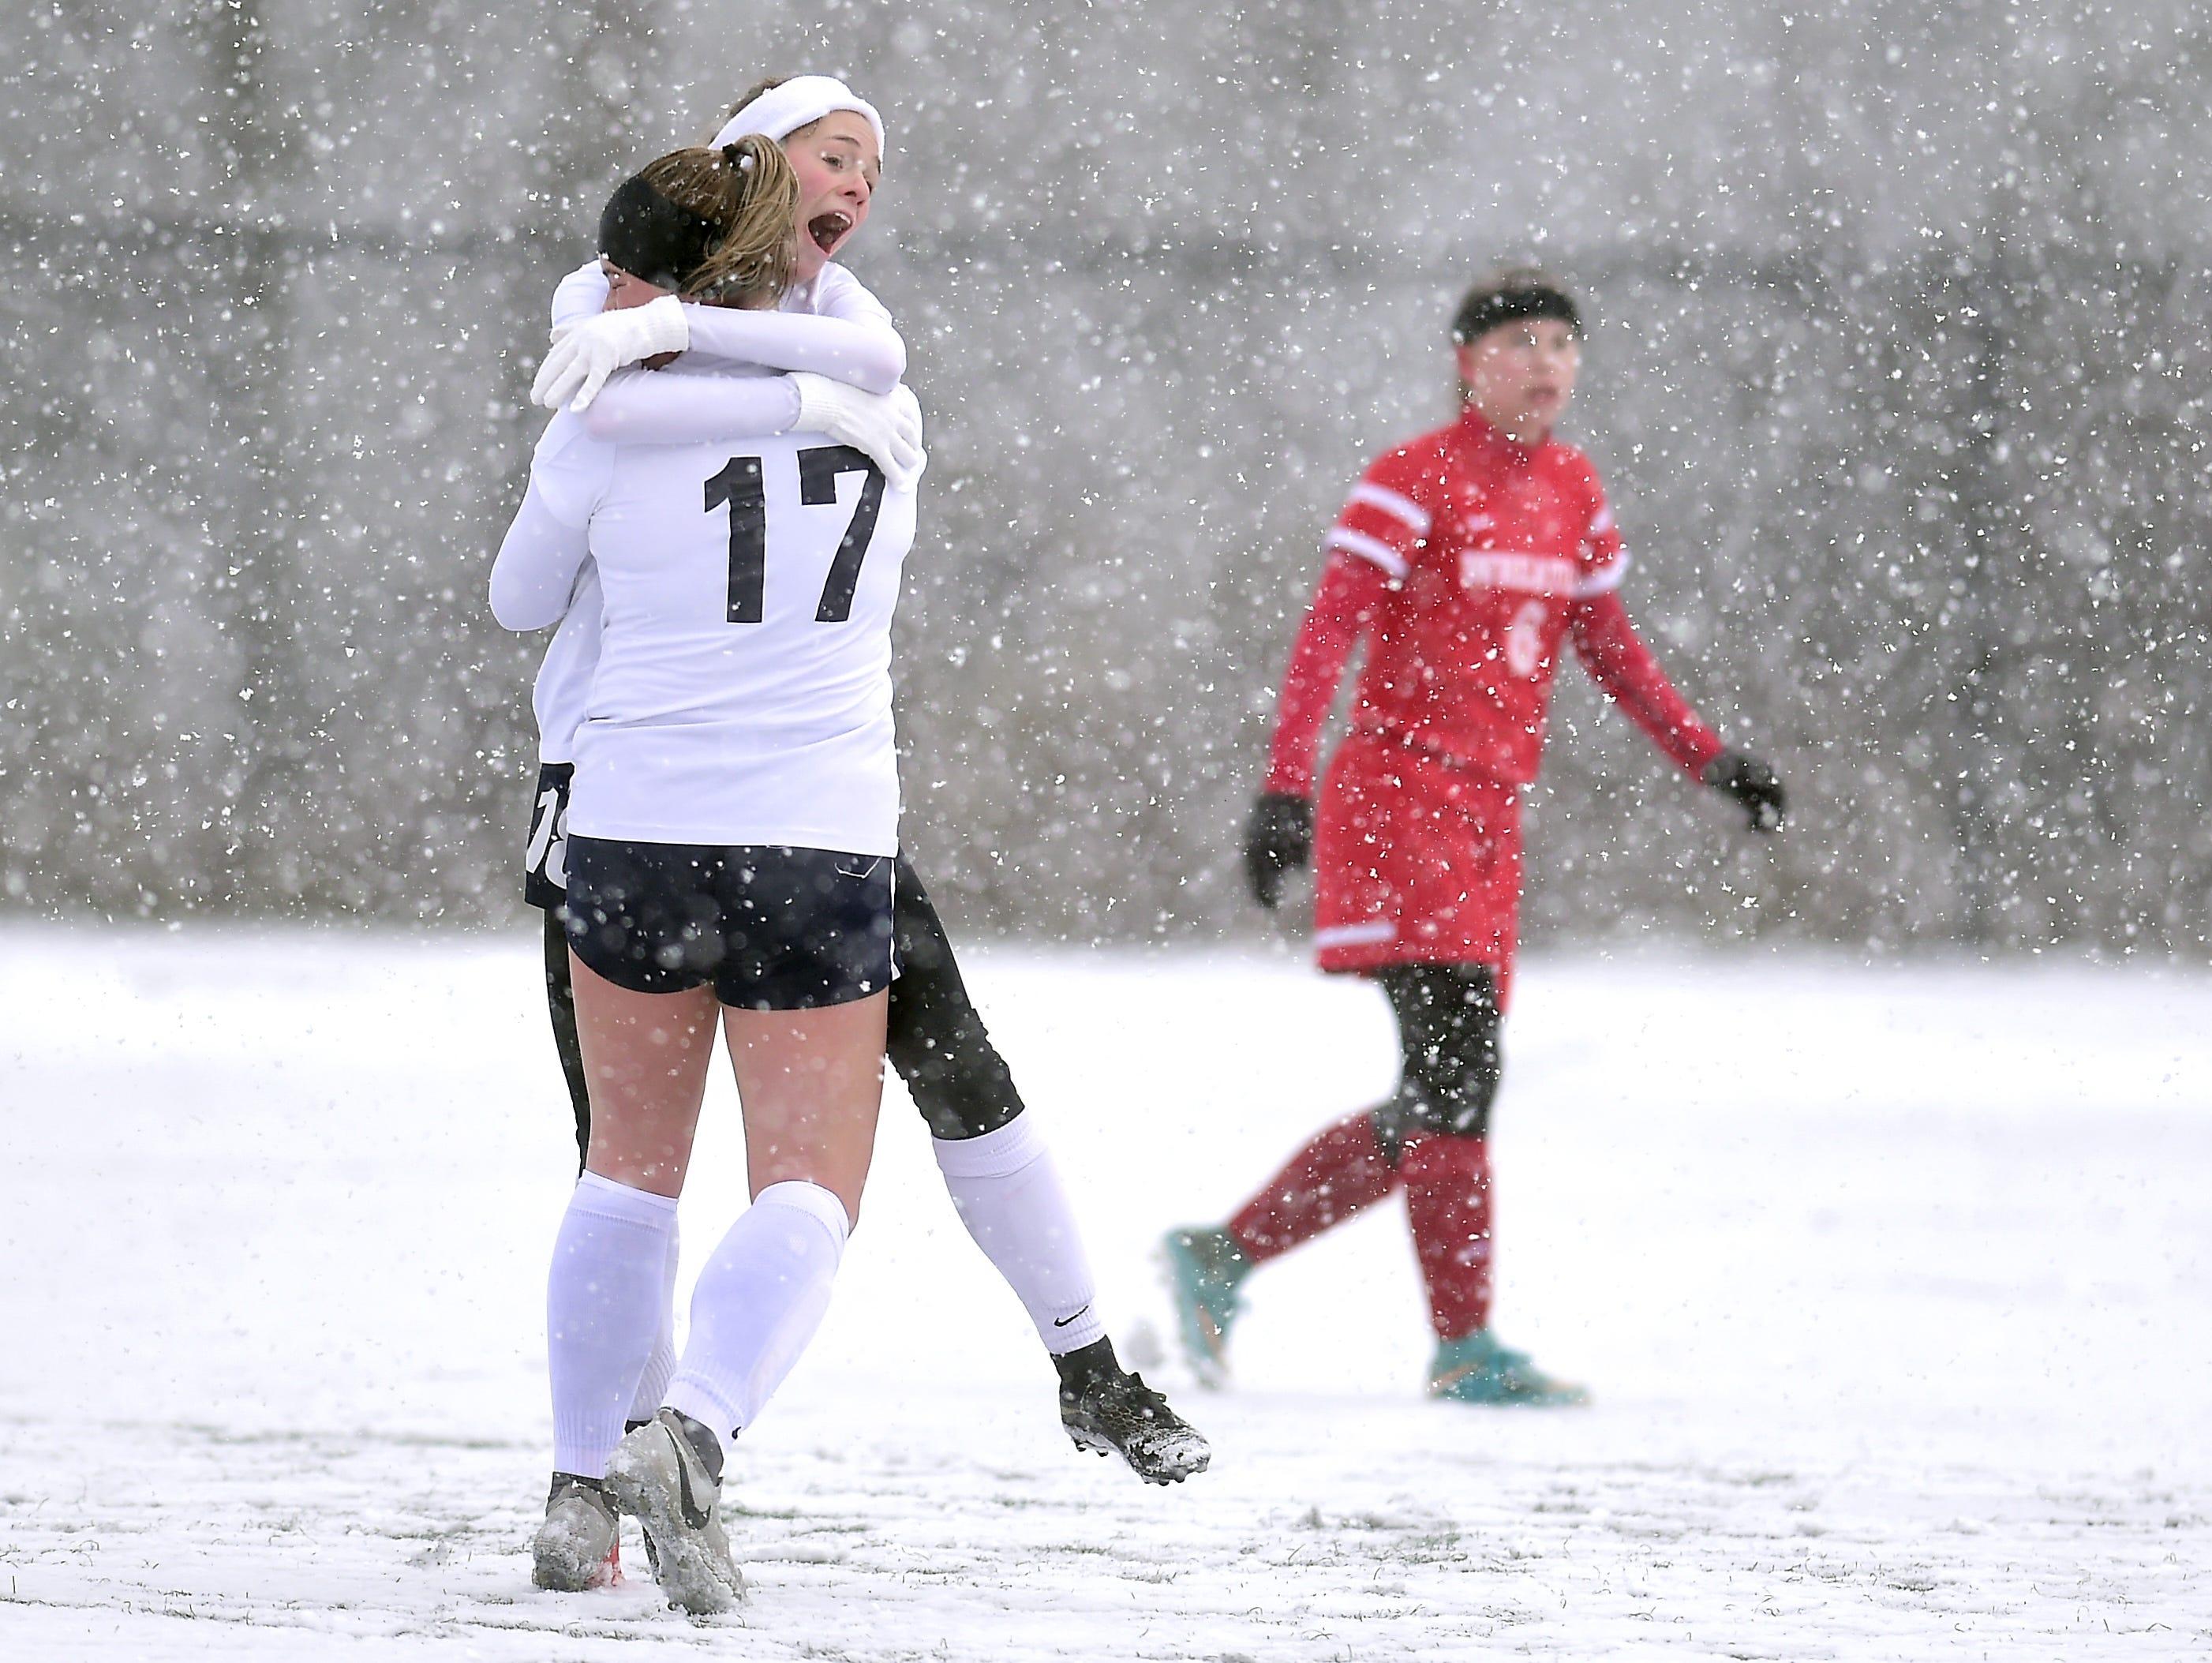 Chenango Forks vs. Wheatley, NYSPHSAA Girls Soccer Championship, Cortland High School, Cortland, NY. Saturday, November 10, 2018.